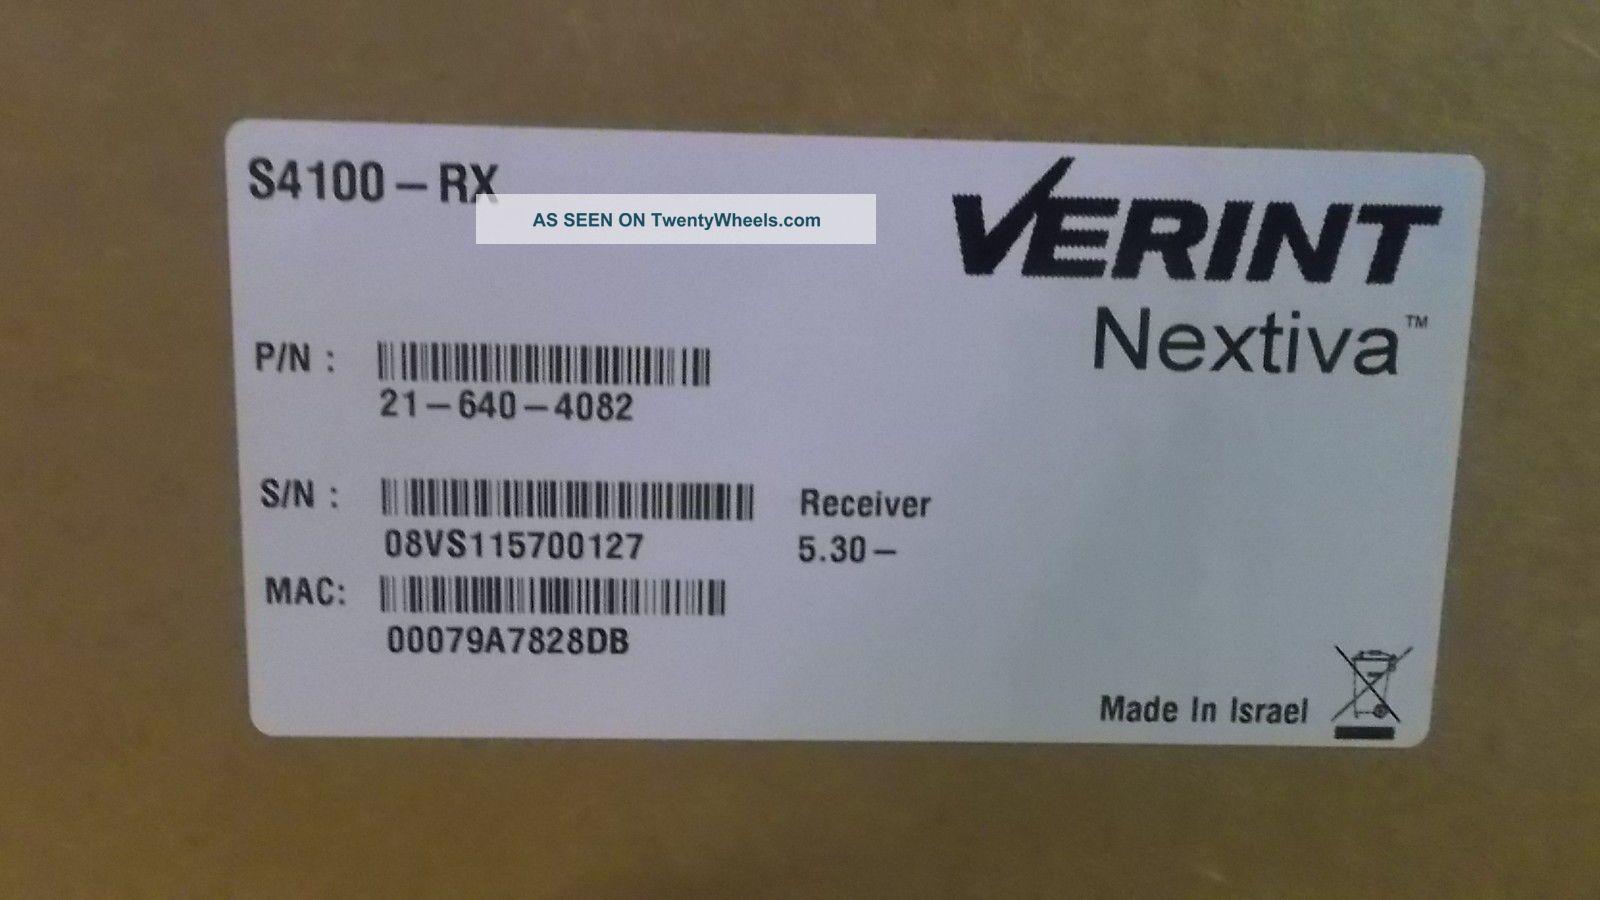 Verint Nextiva